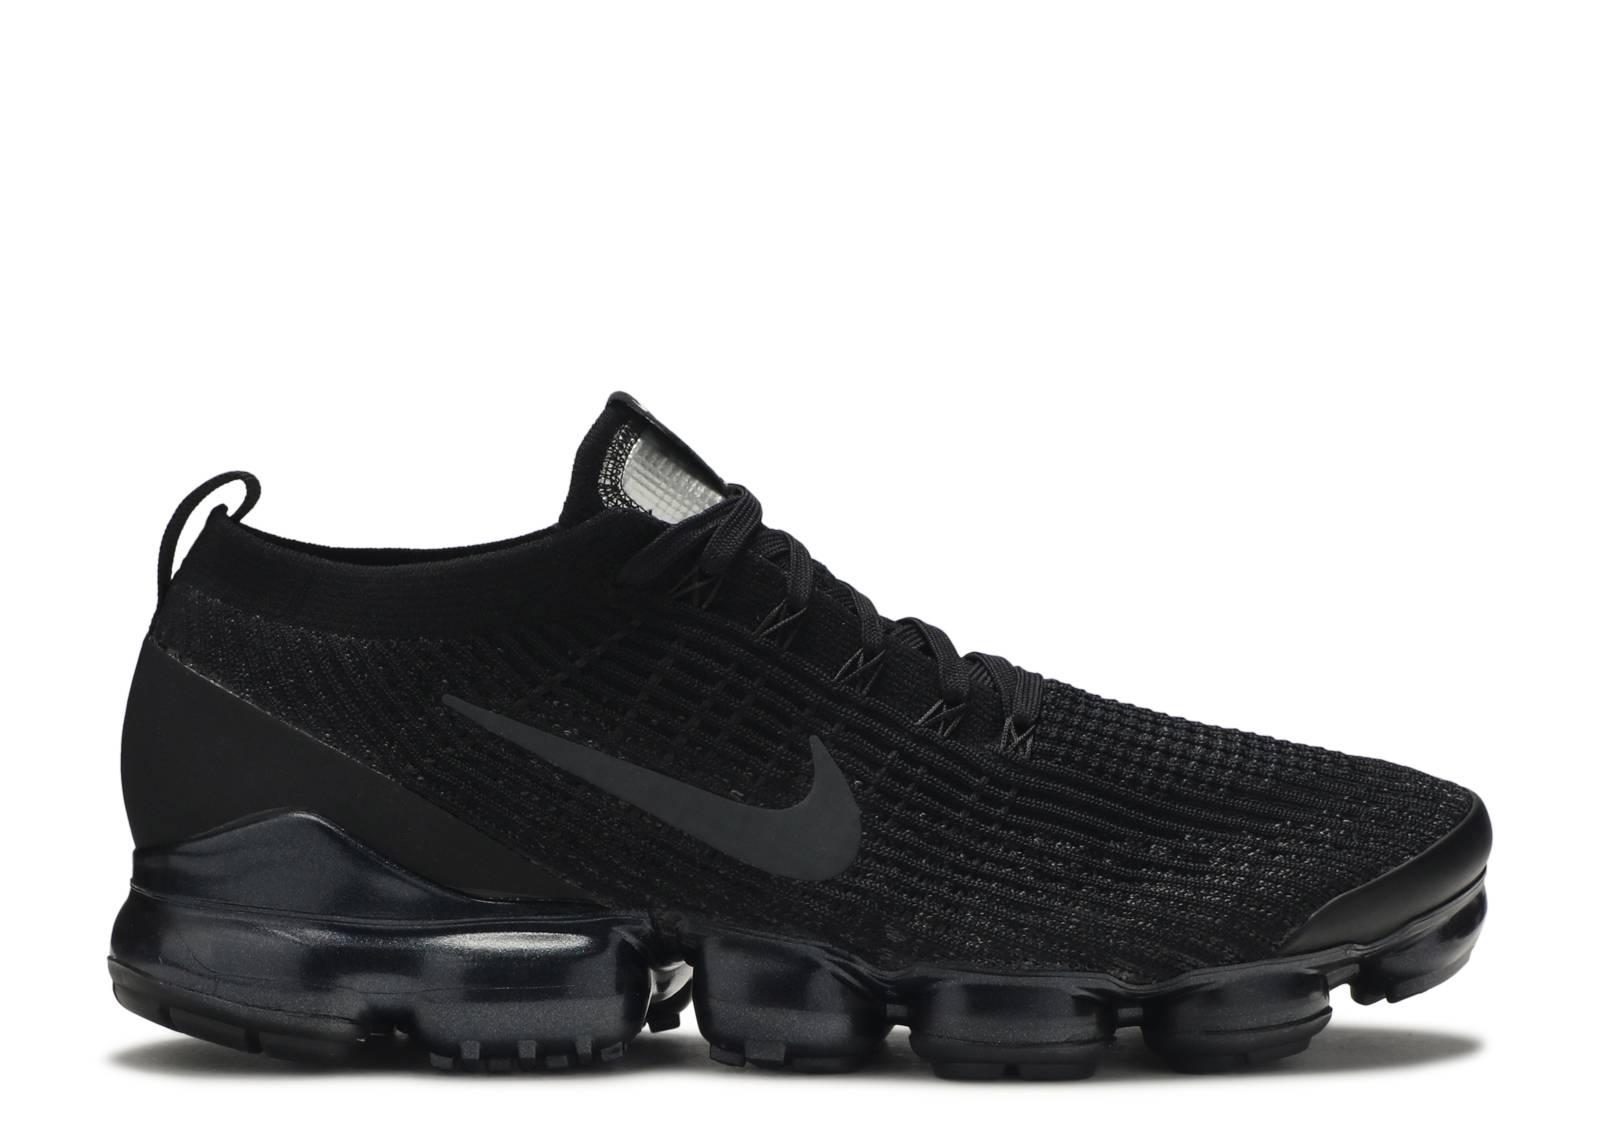 Nike Vapormax Sneakers | Flight Club